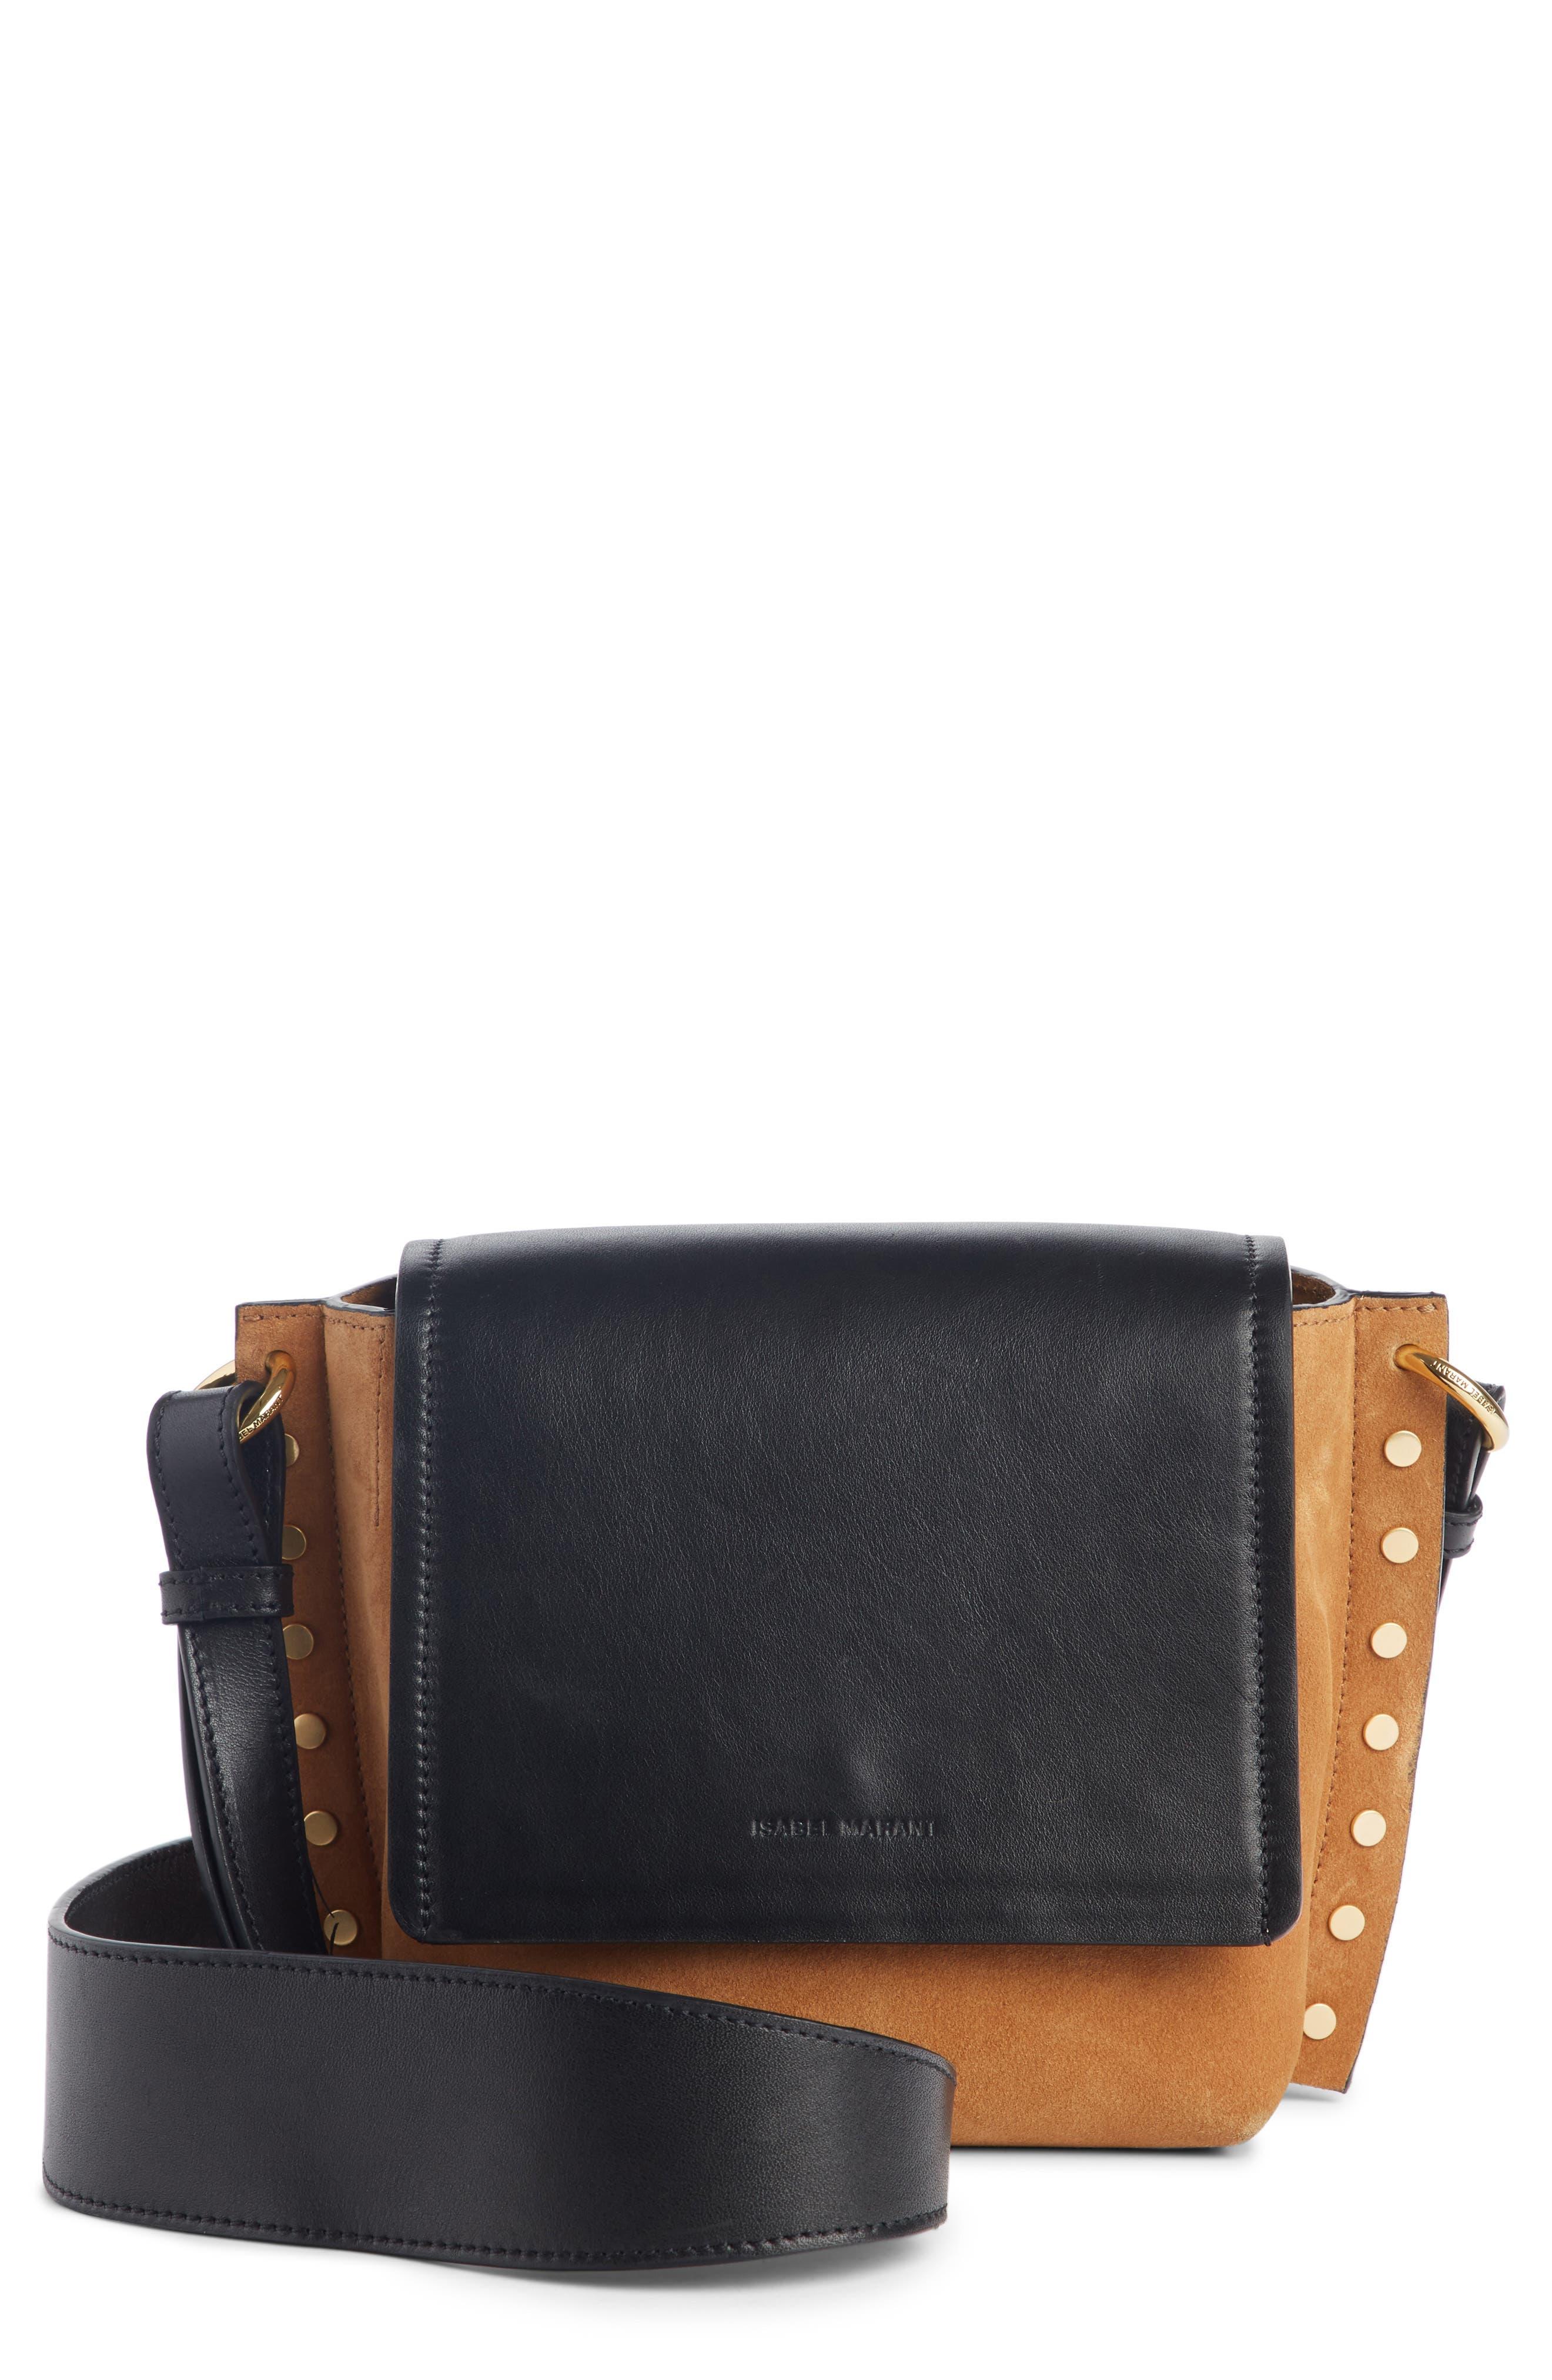 Kleny Colorblock Leather & Suede Shoulder Bag,                             Main thumbnail 1, color,                             CAMEL